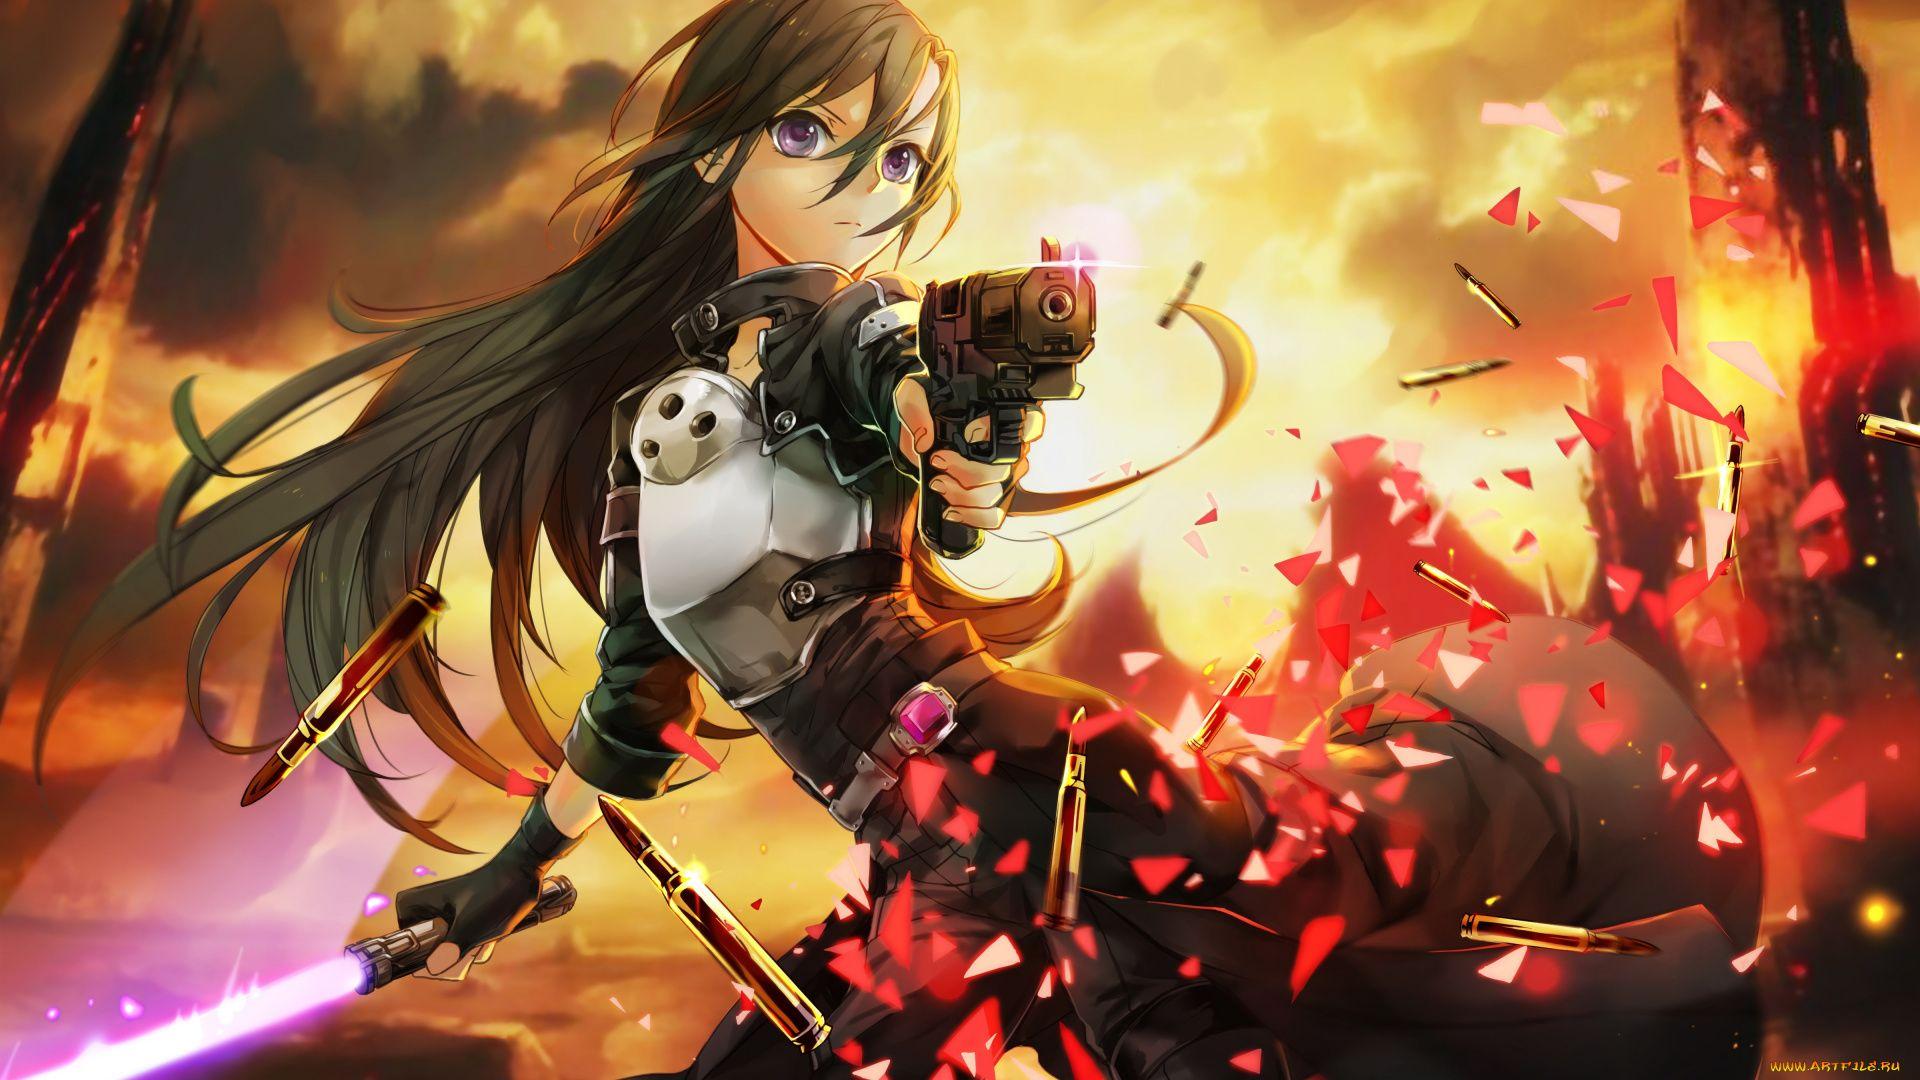 Hd Anime desktop background hd